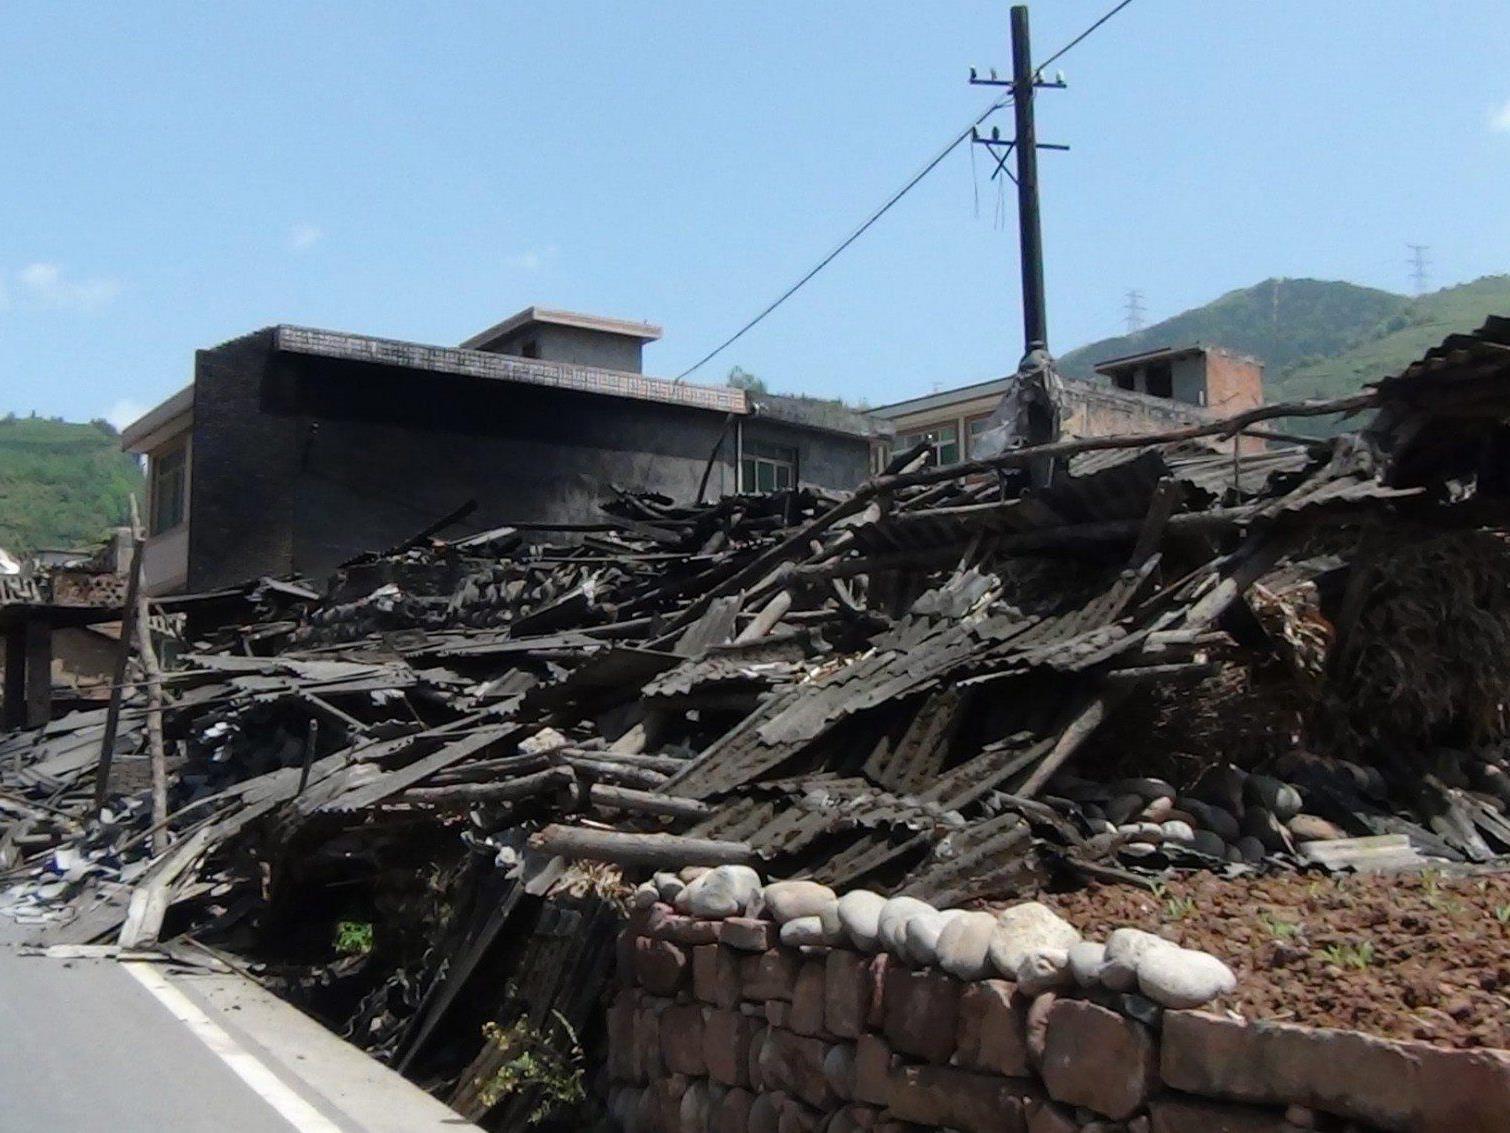 Mehr als 150 Tote bei Erdbeben in China - -- VOL.AT